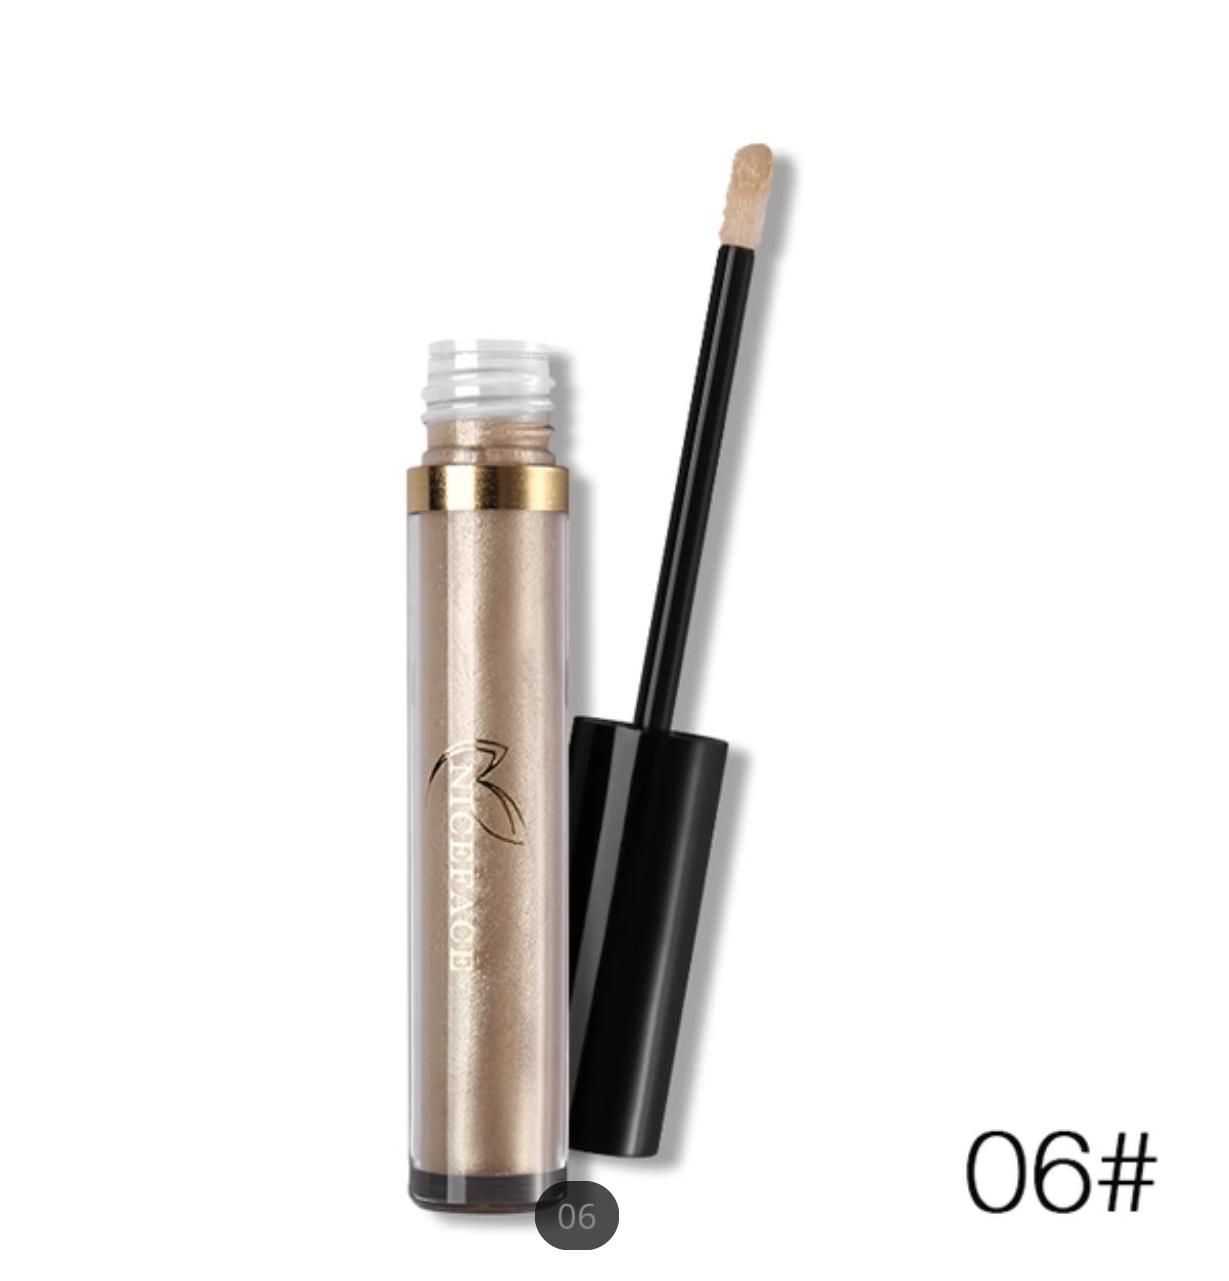 Makeup Stick 06 Lys Nougat